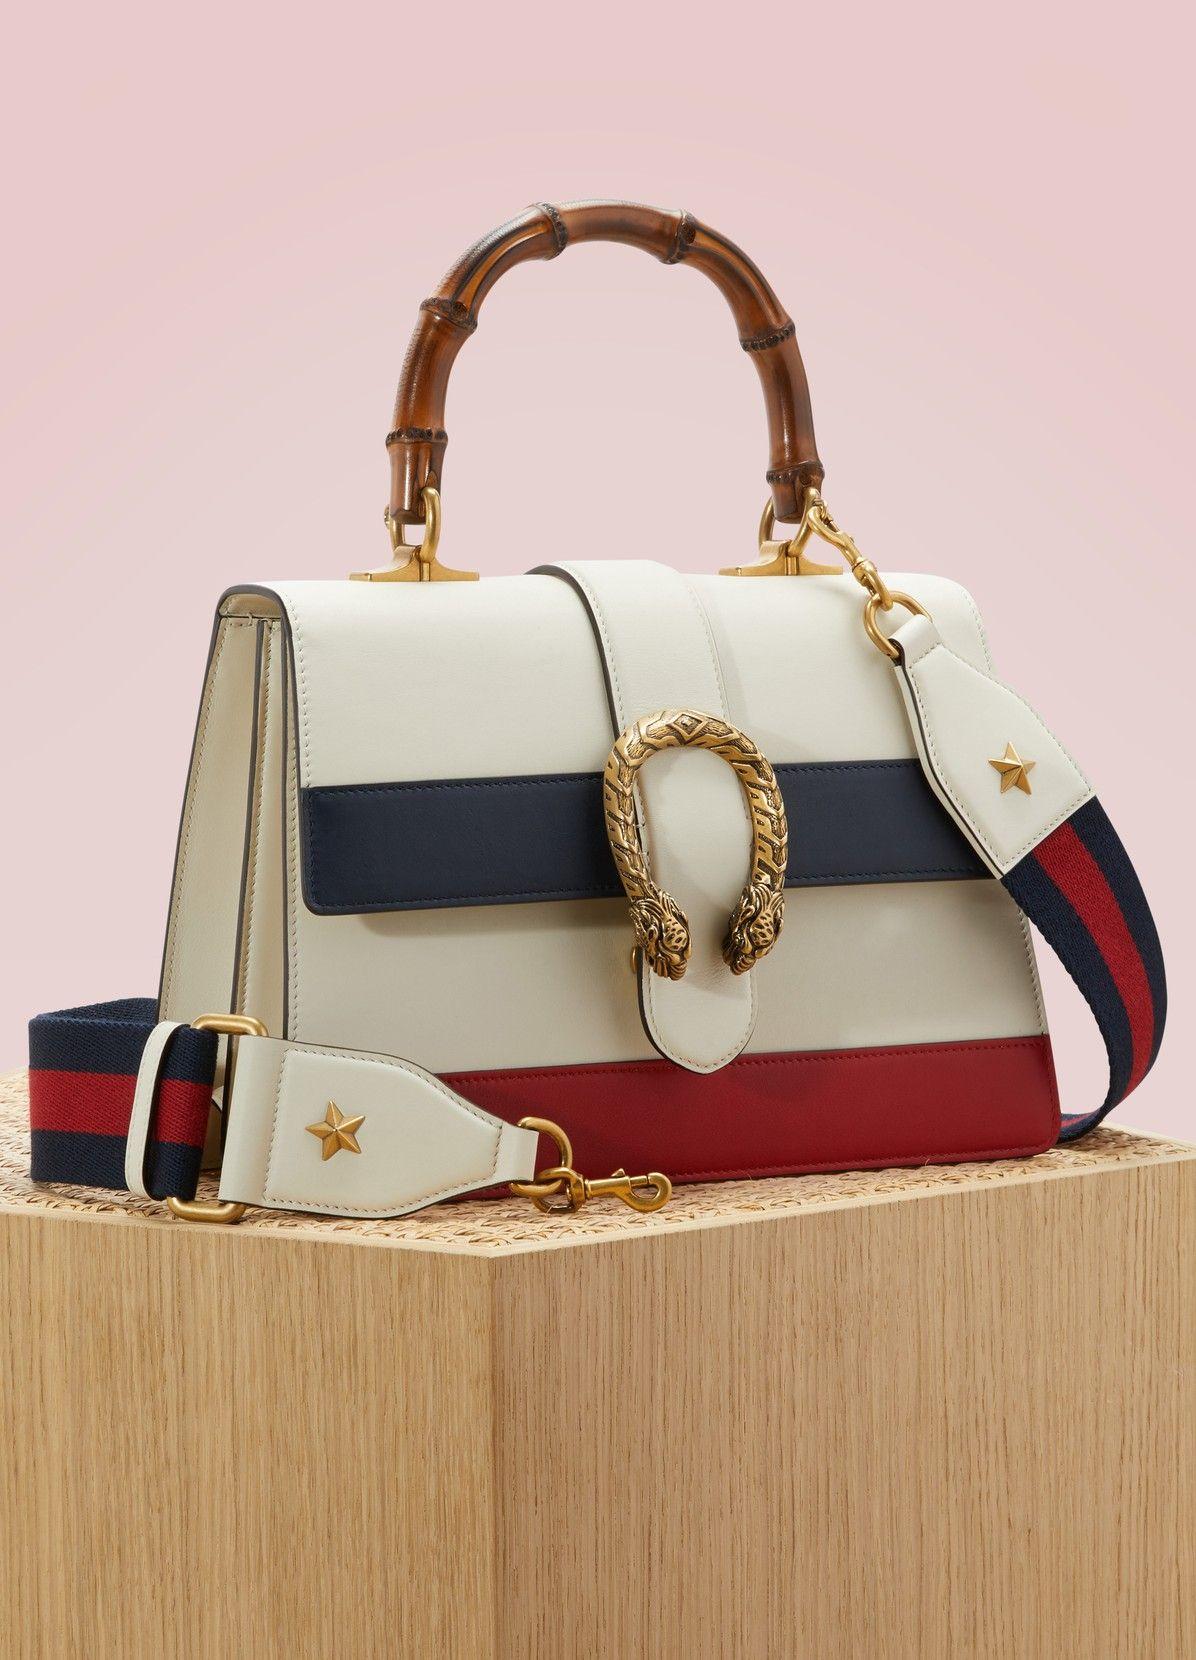 4d5f0f9ac GUCCI Dionysus Leather Handbag | Cores verão 2018/19 | Leather ...